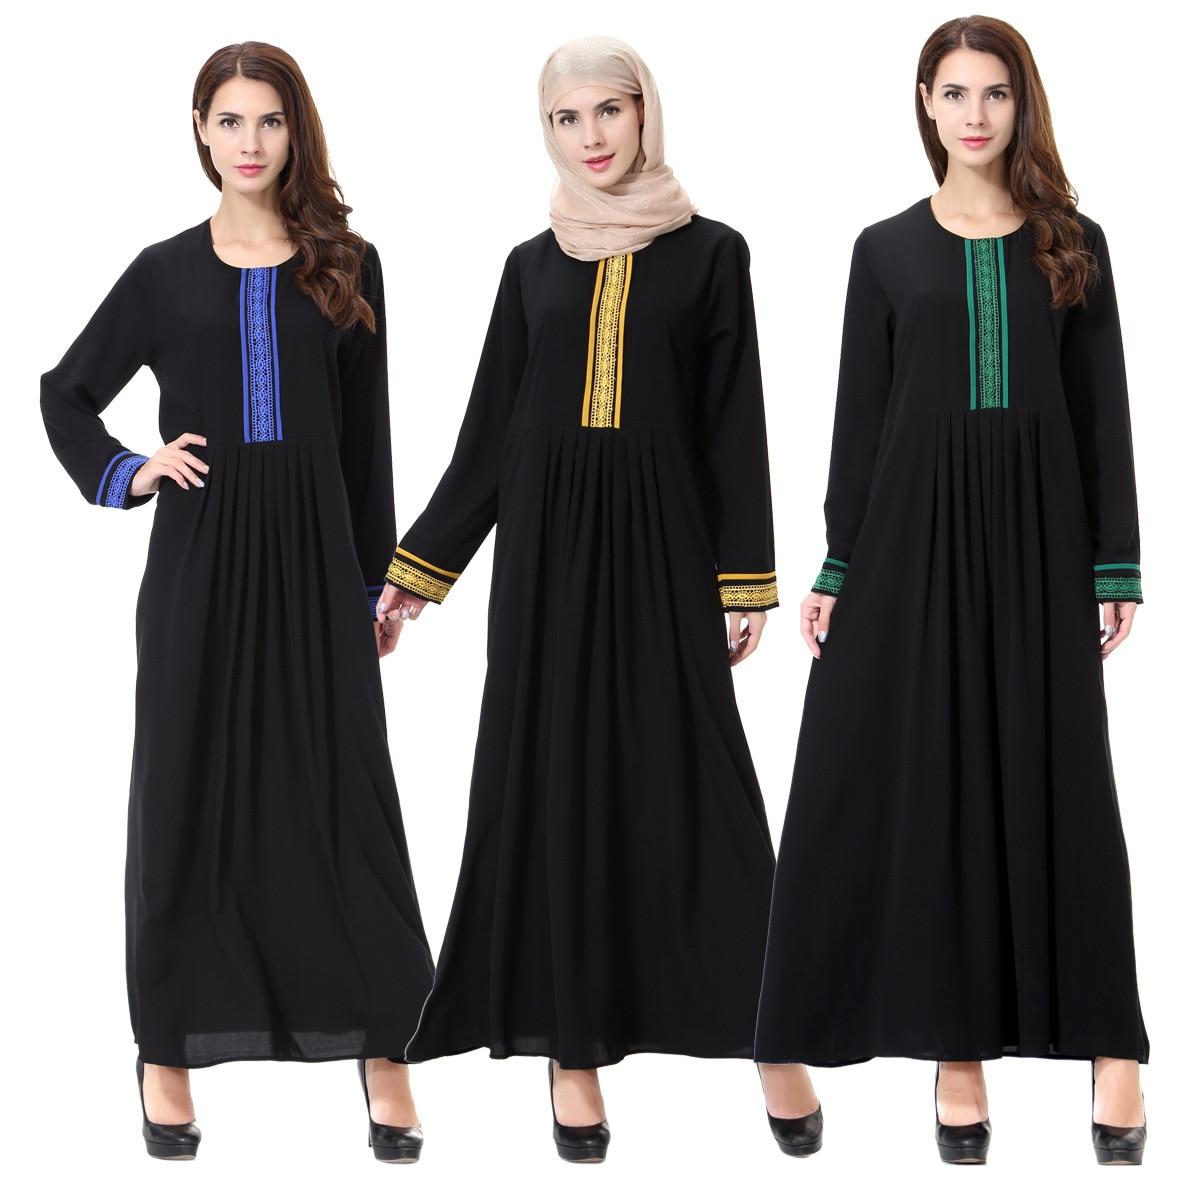 Abaya Dress Muslim Women Long Sleeve Arab Abaya Jalabiya Islamic Women Dress Clothing Robe Kaftan Mother & Kids Strollers Accessories